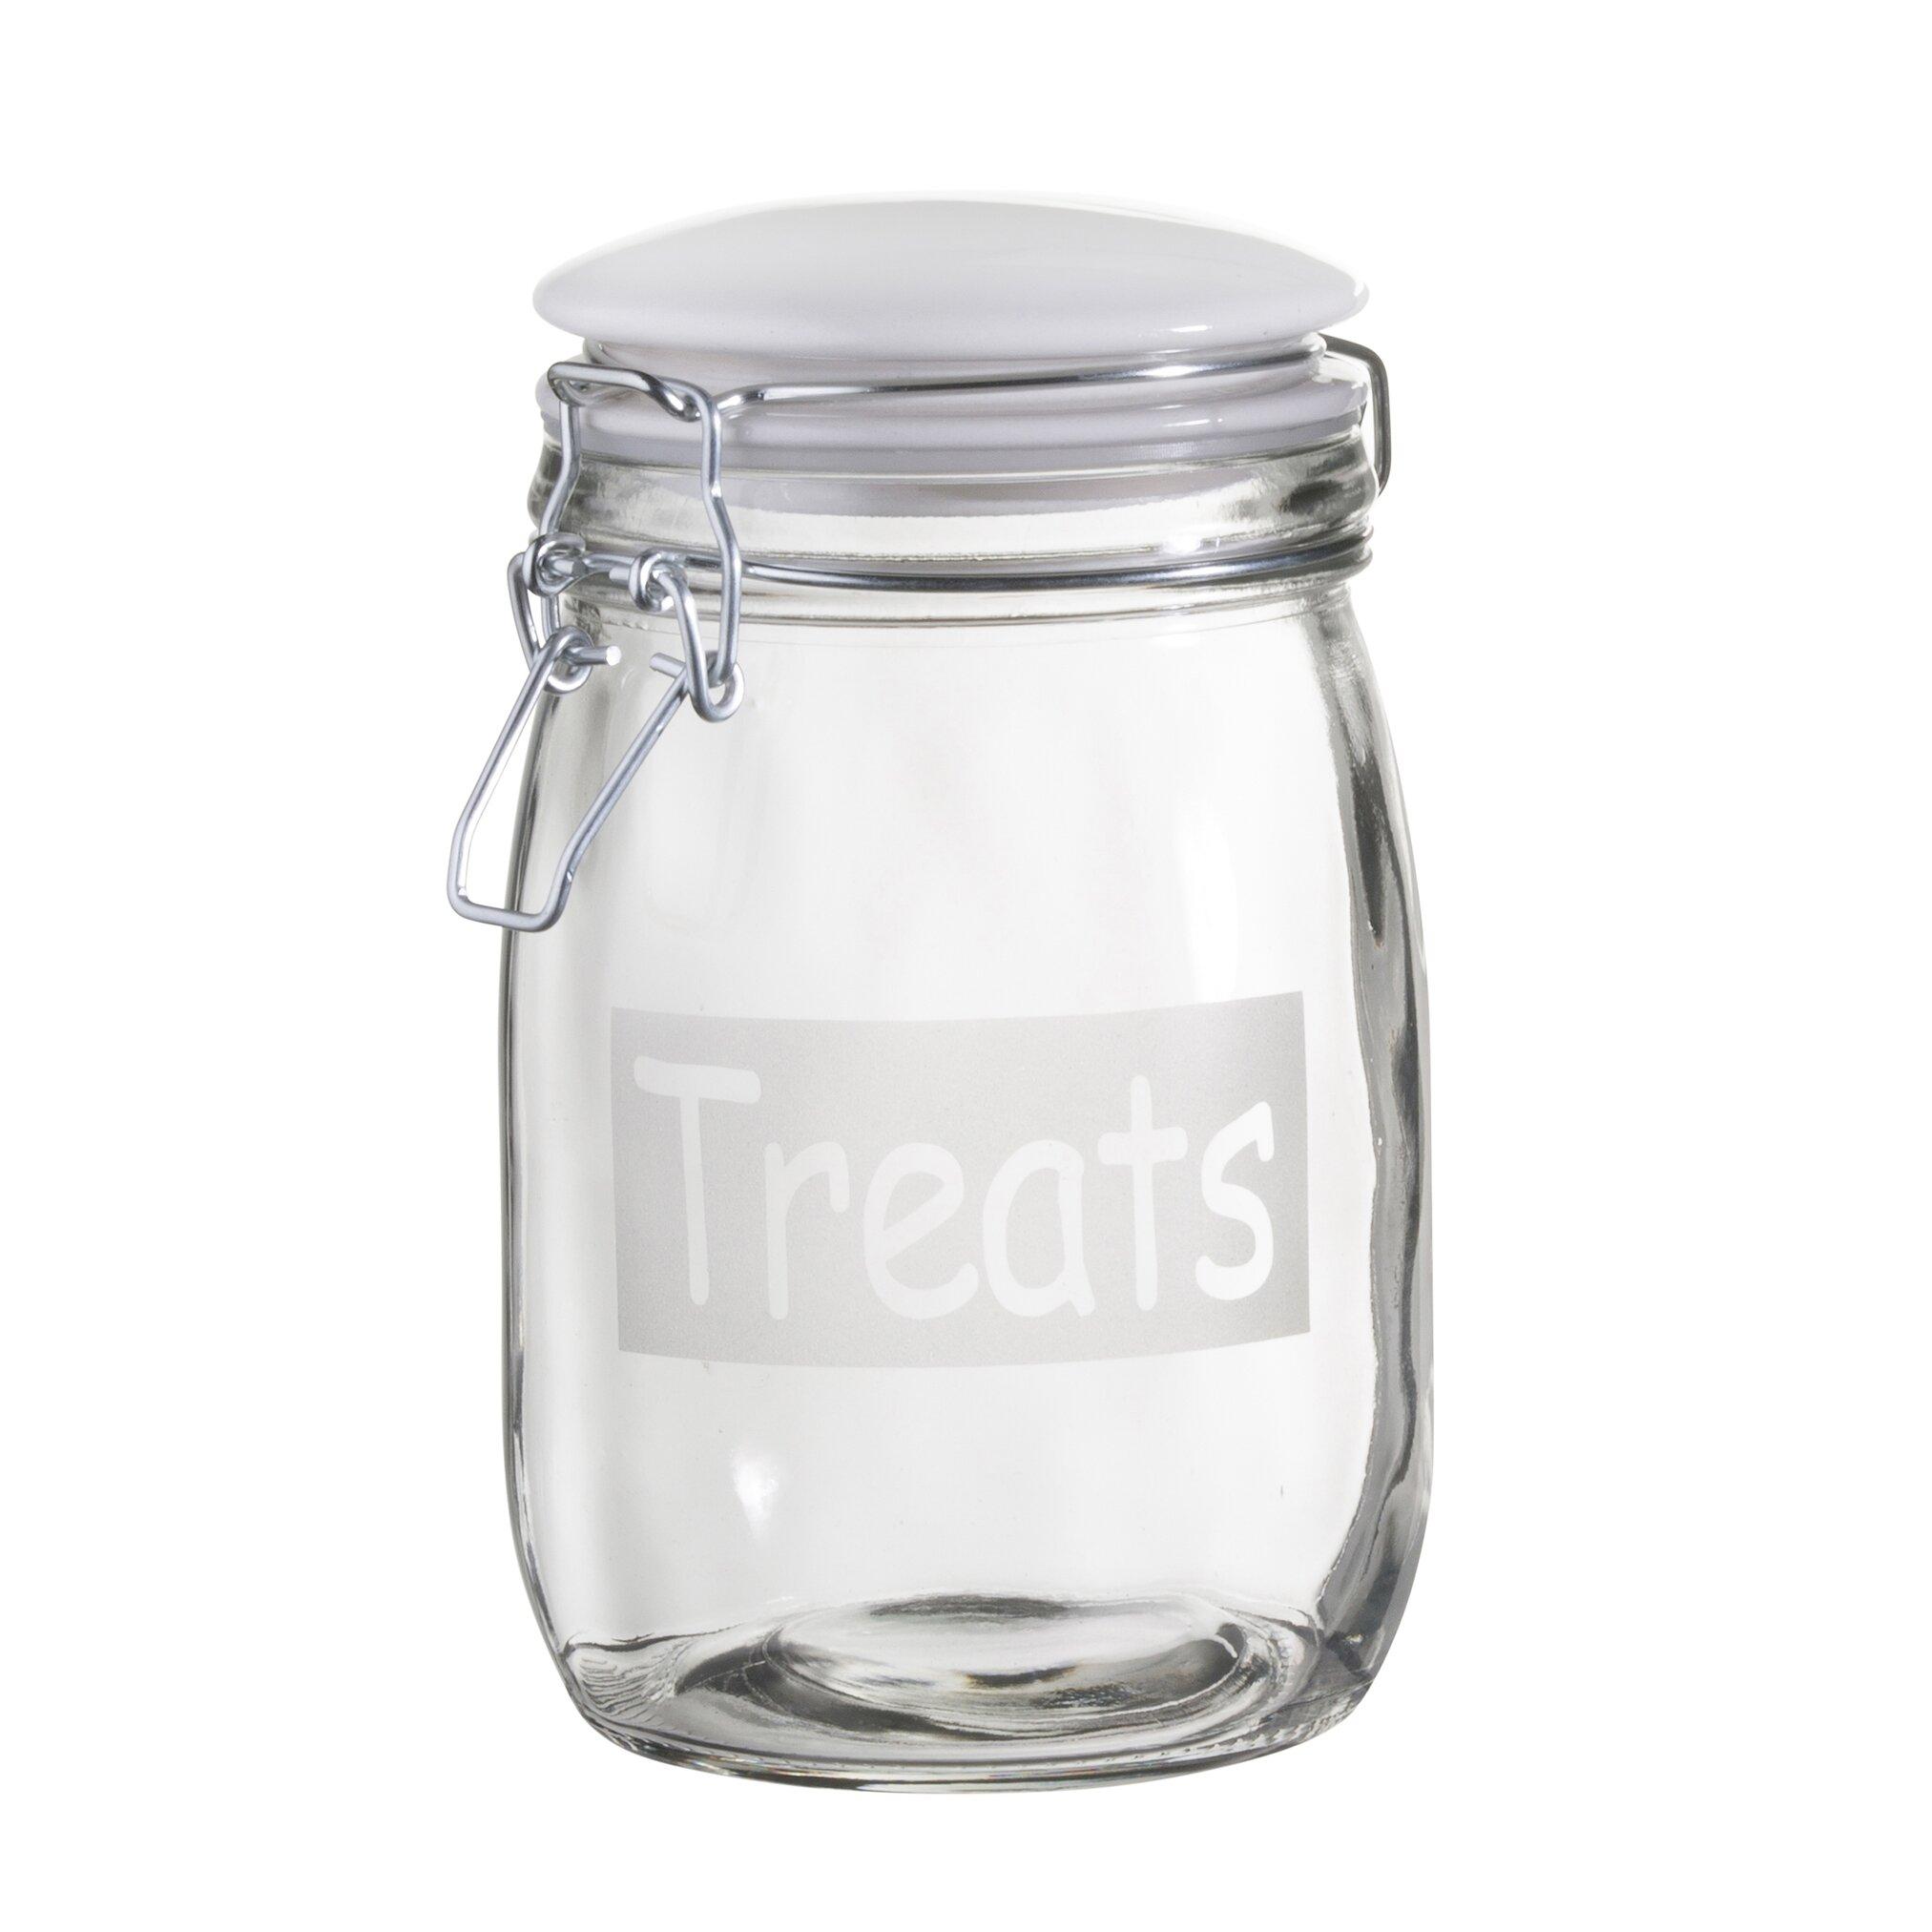 Global Amici Pet Treats Jar